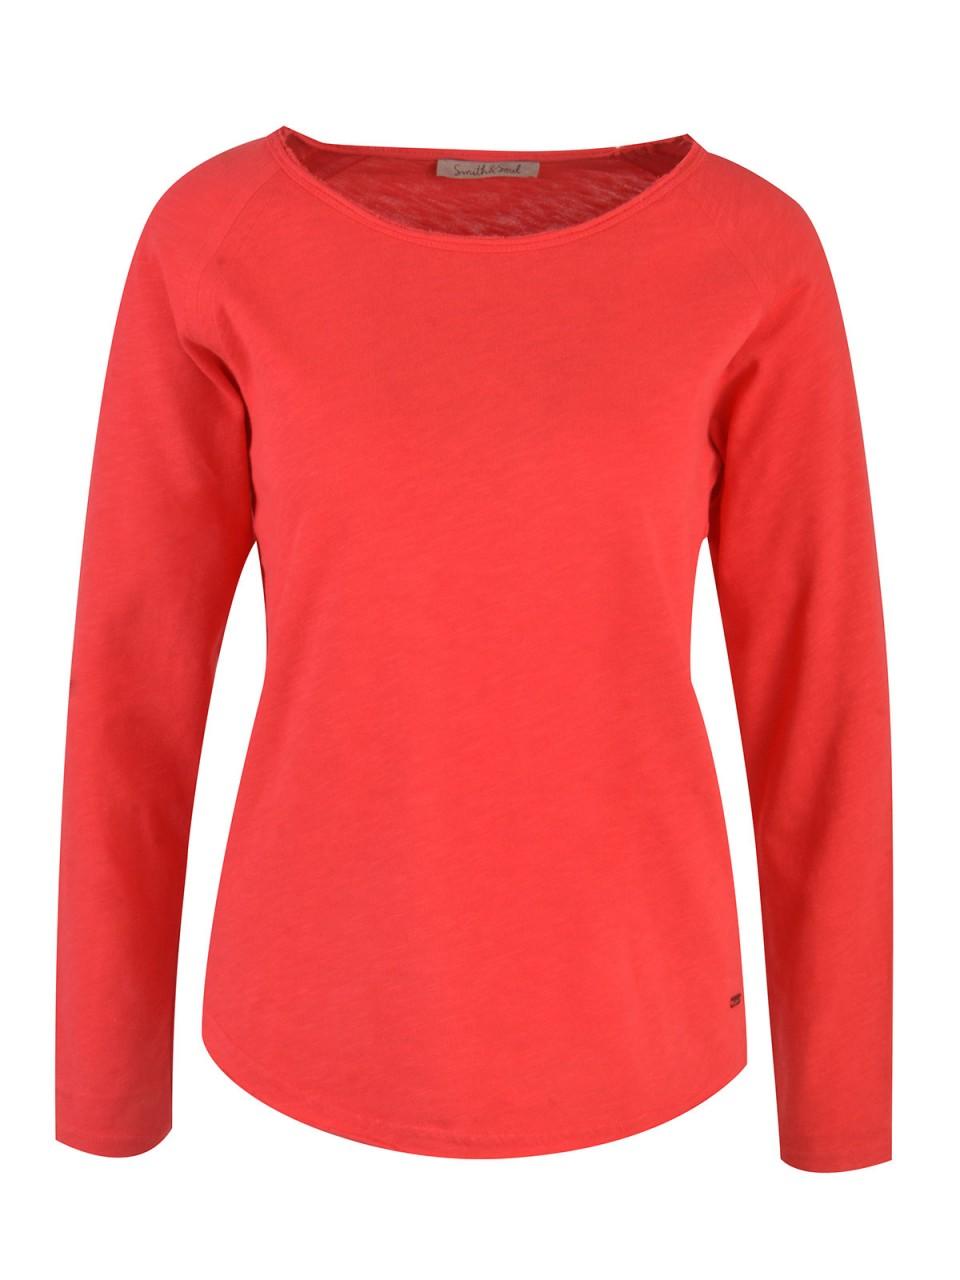 Oberteile - SMITH SOUL Damen Shirt, rot  - Onlineshop Designermode.com